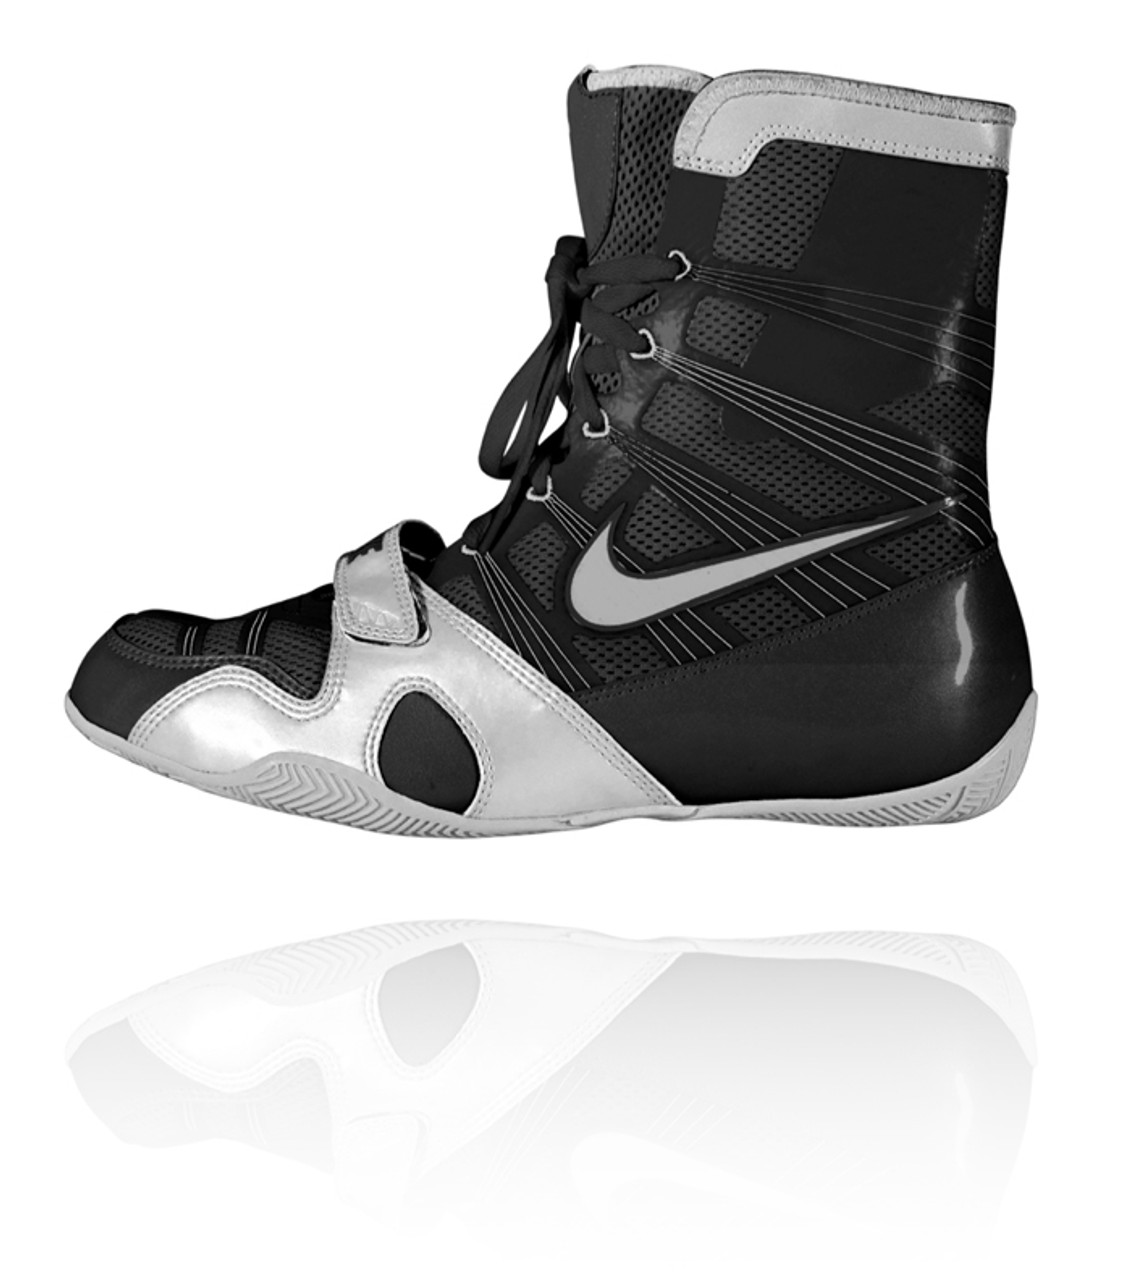 Renacimiento Cosquillas Reina  Nike HyperKO - Black / Silver Boxing Shoes - PRO BOXING SHOP